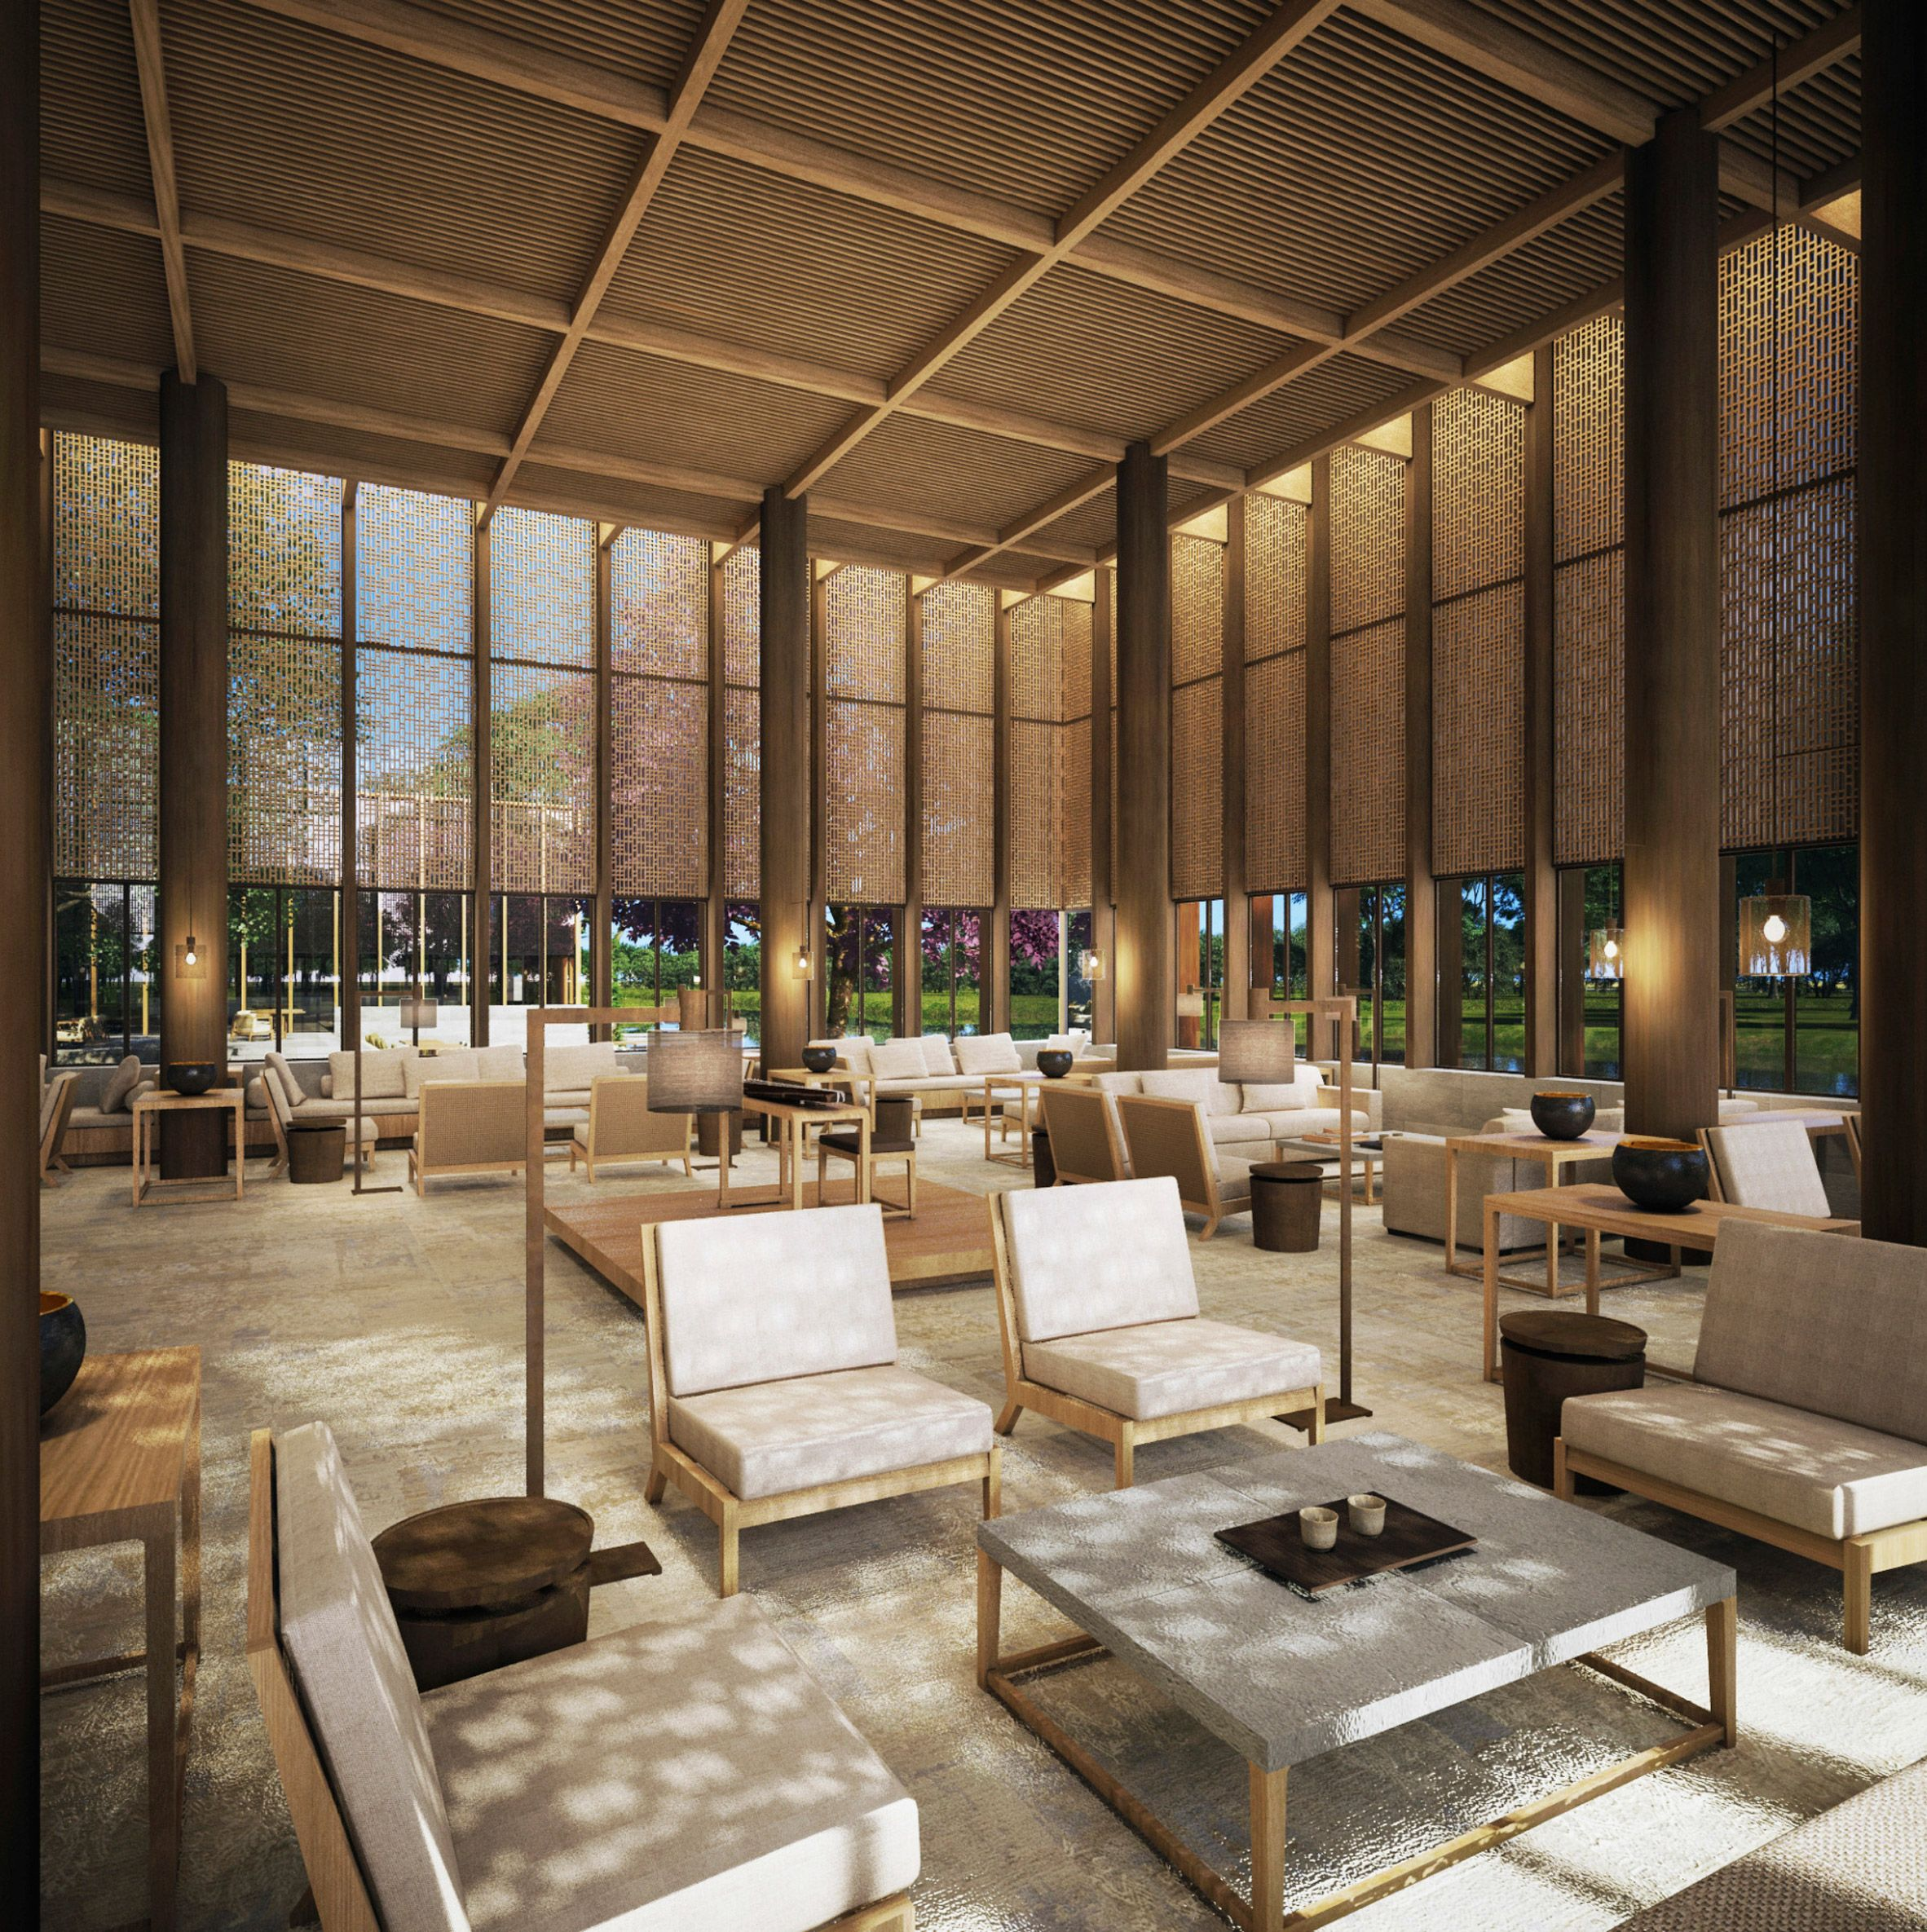 aman in shanghai id resort hotel lobby design hotel lounge rh pinterest com